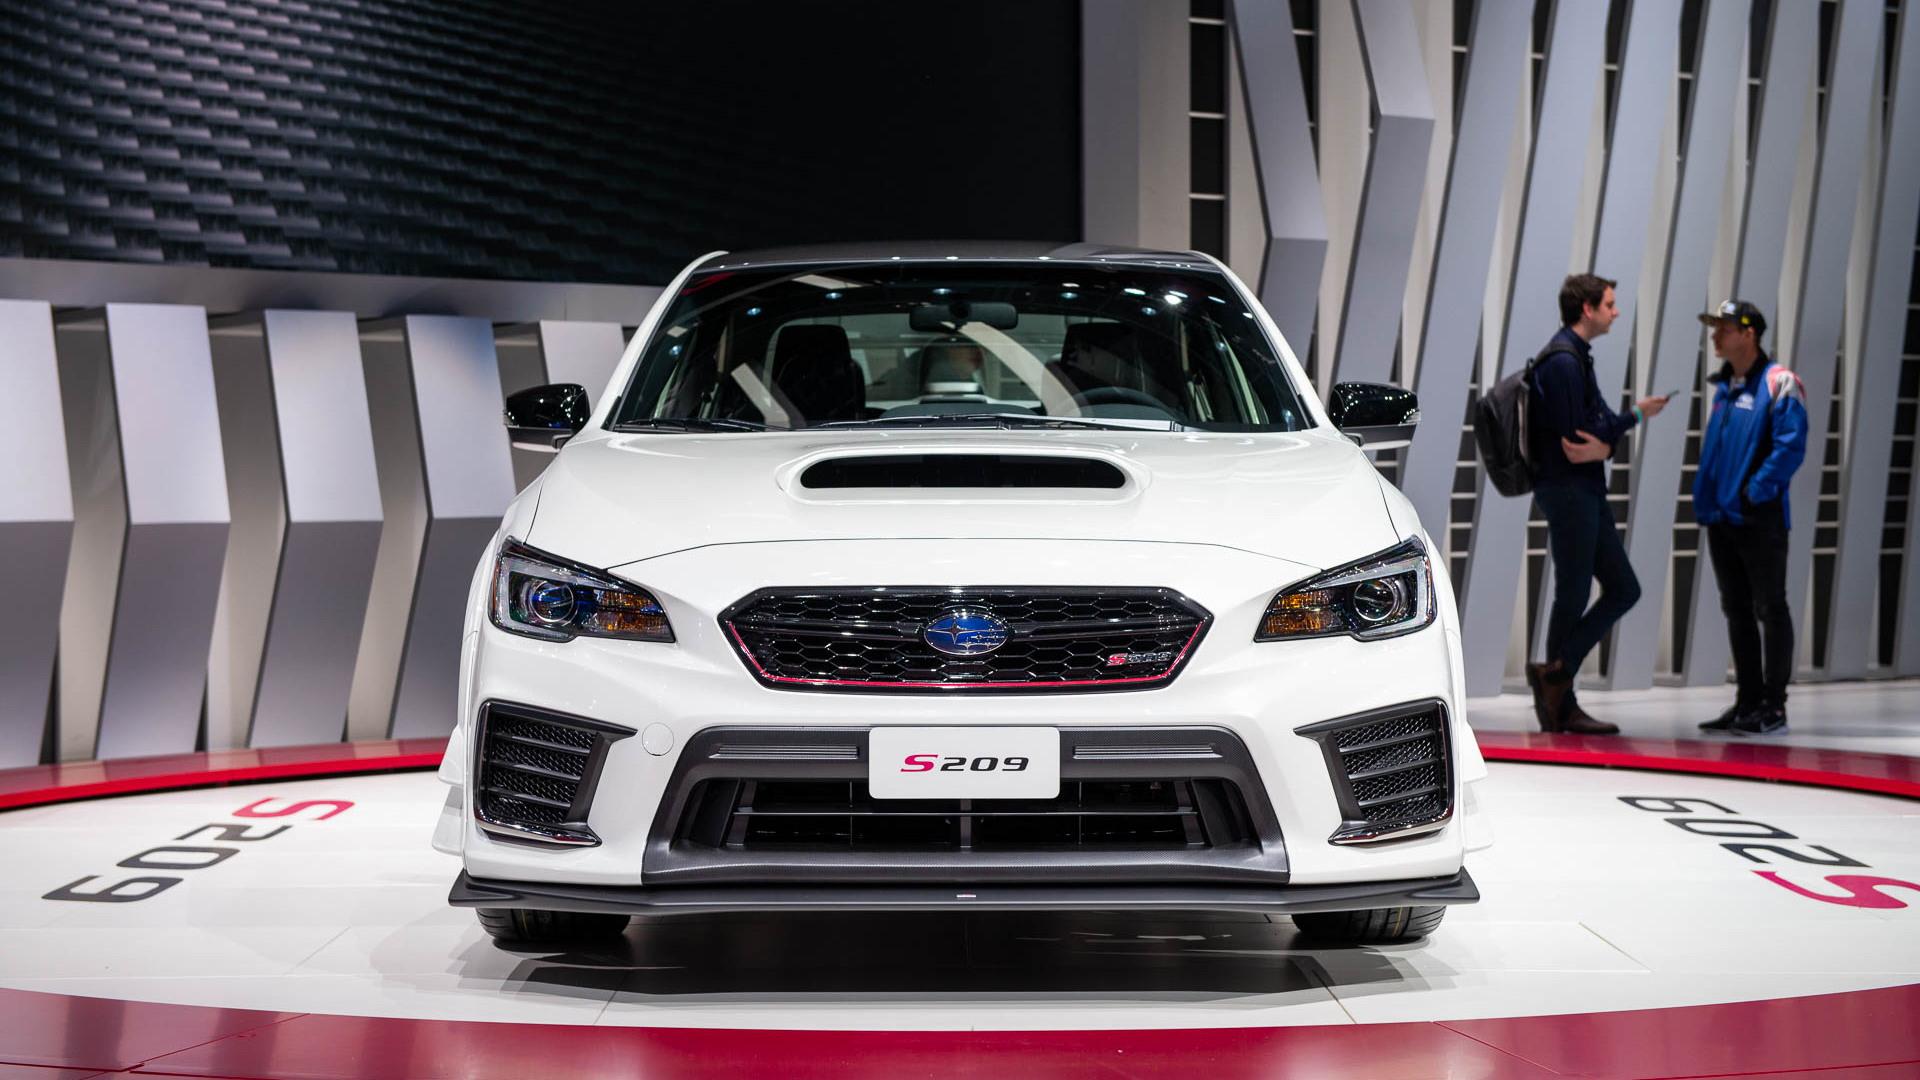 2019 Subaru WRX STI S209, 2019 Detroit auto show